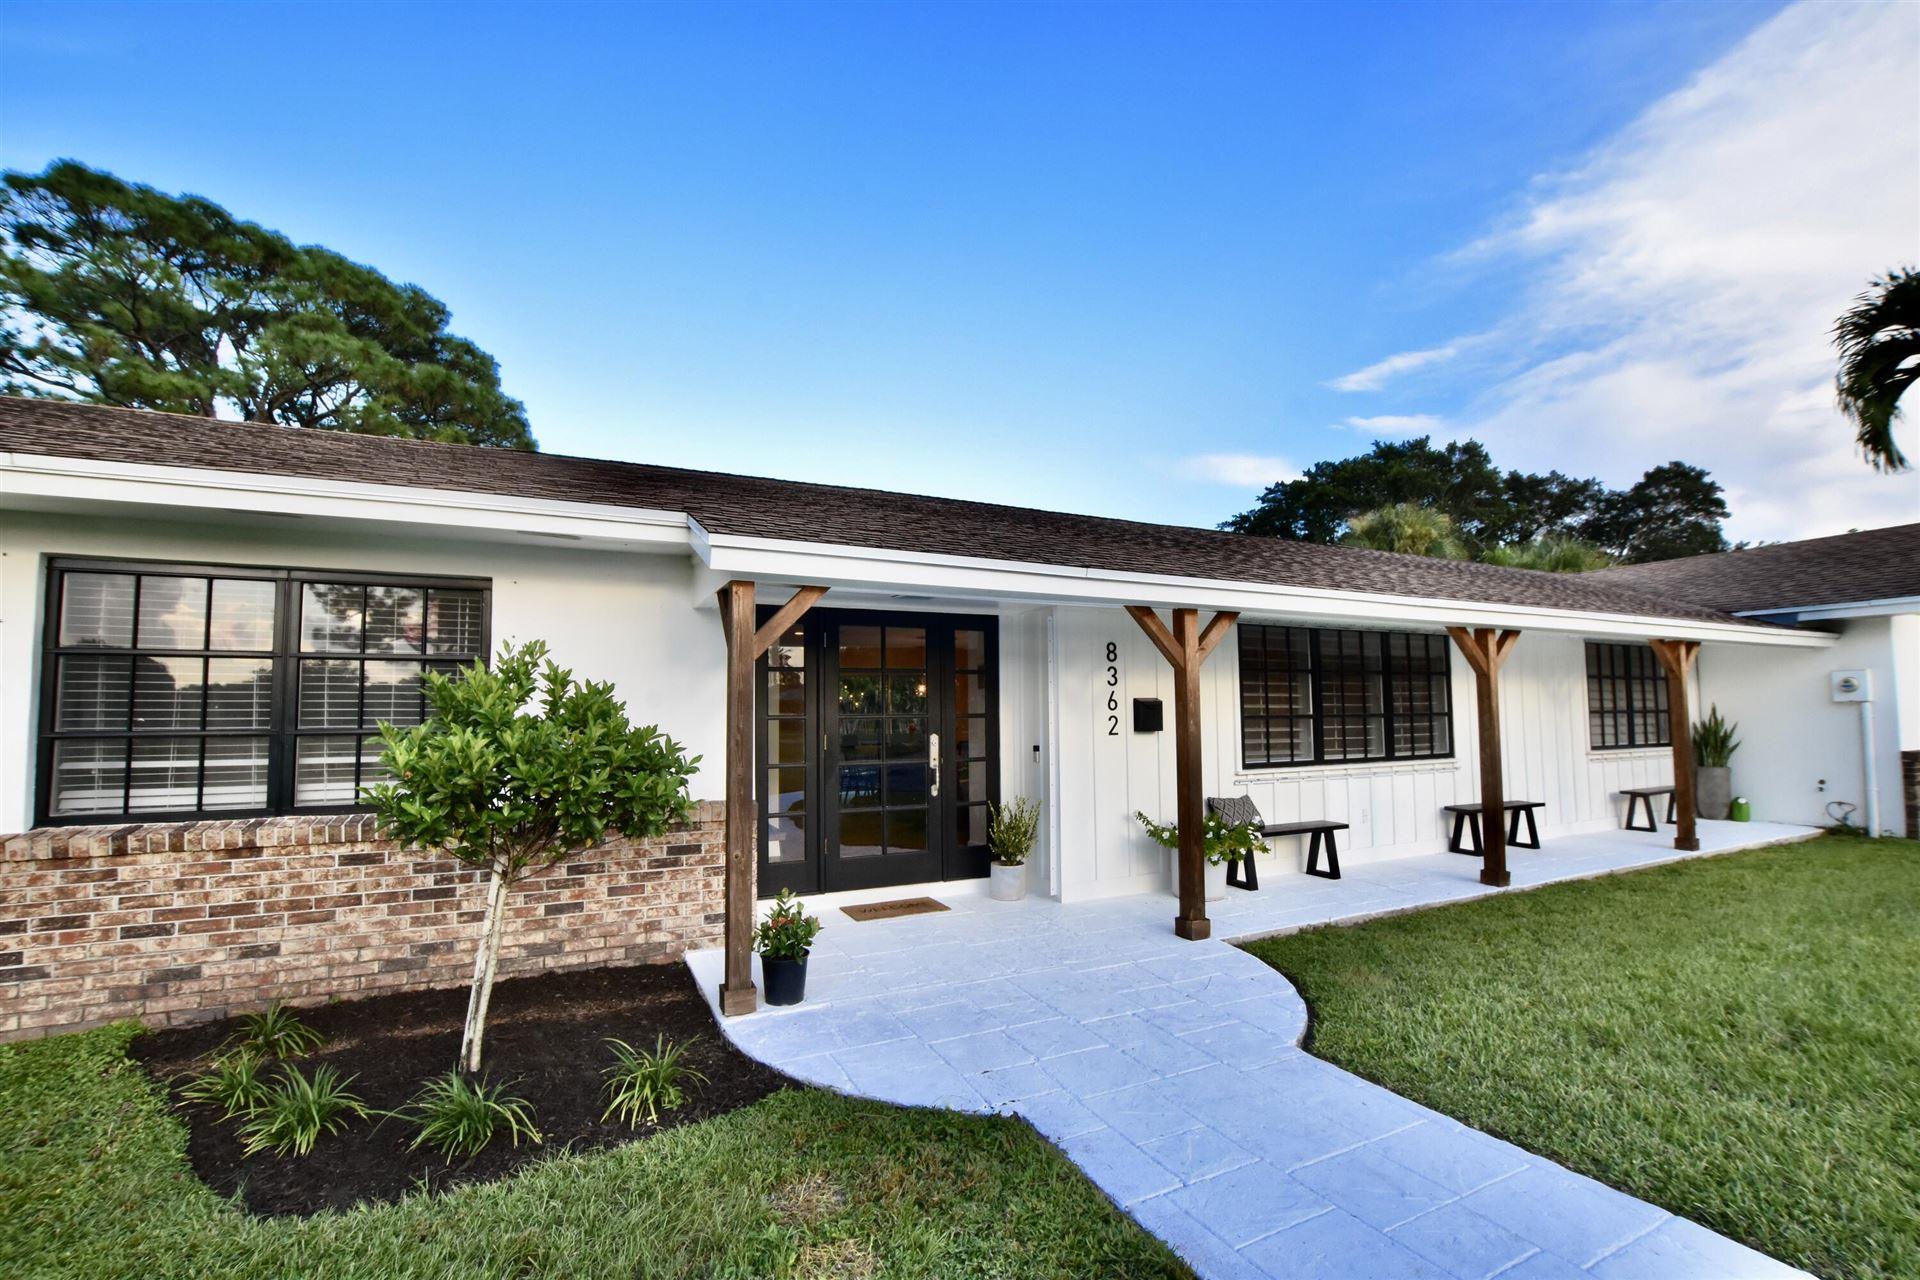 Photo of 8362 Kelso Drive, Palm Beach Gardens, FL 33418 (MLS # RX-10746307)